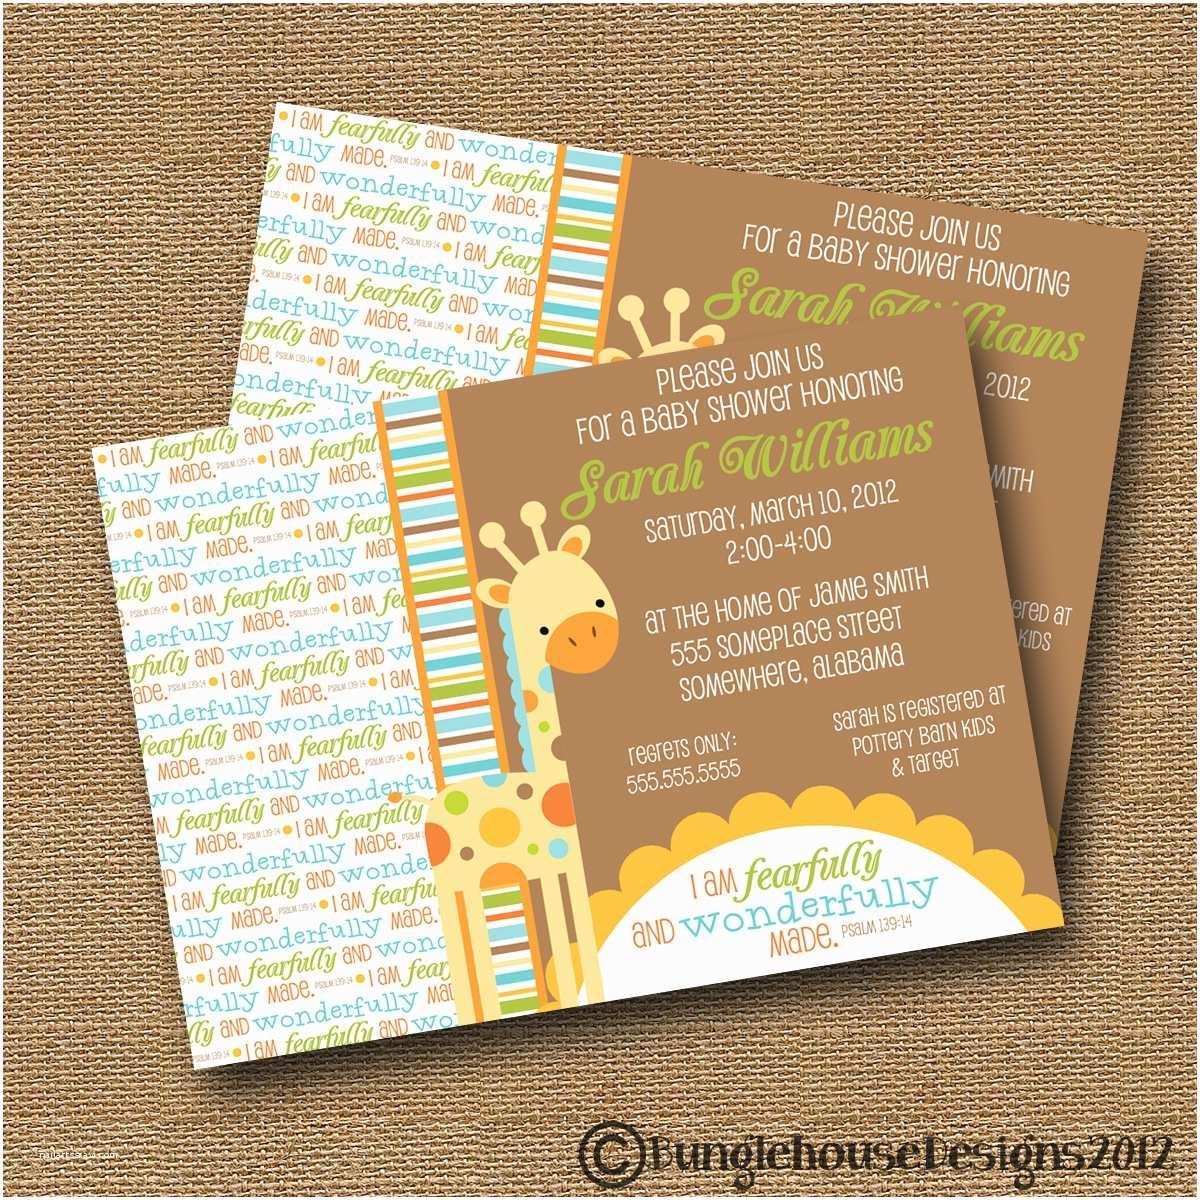 Giraffe Baby Shower Invitations Design Giraffe Baby Shower Invitations Giraffe Baby